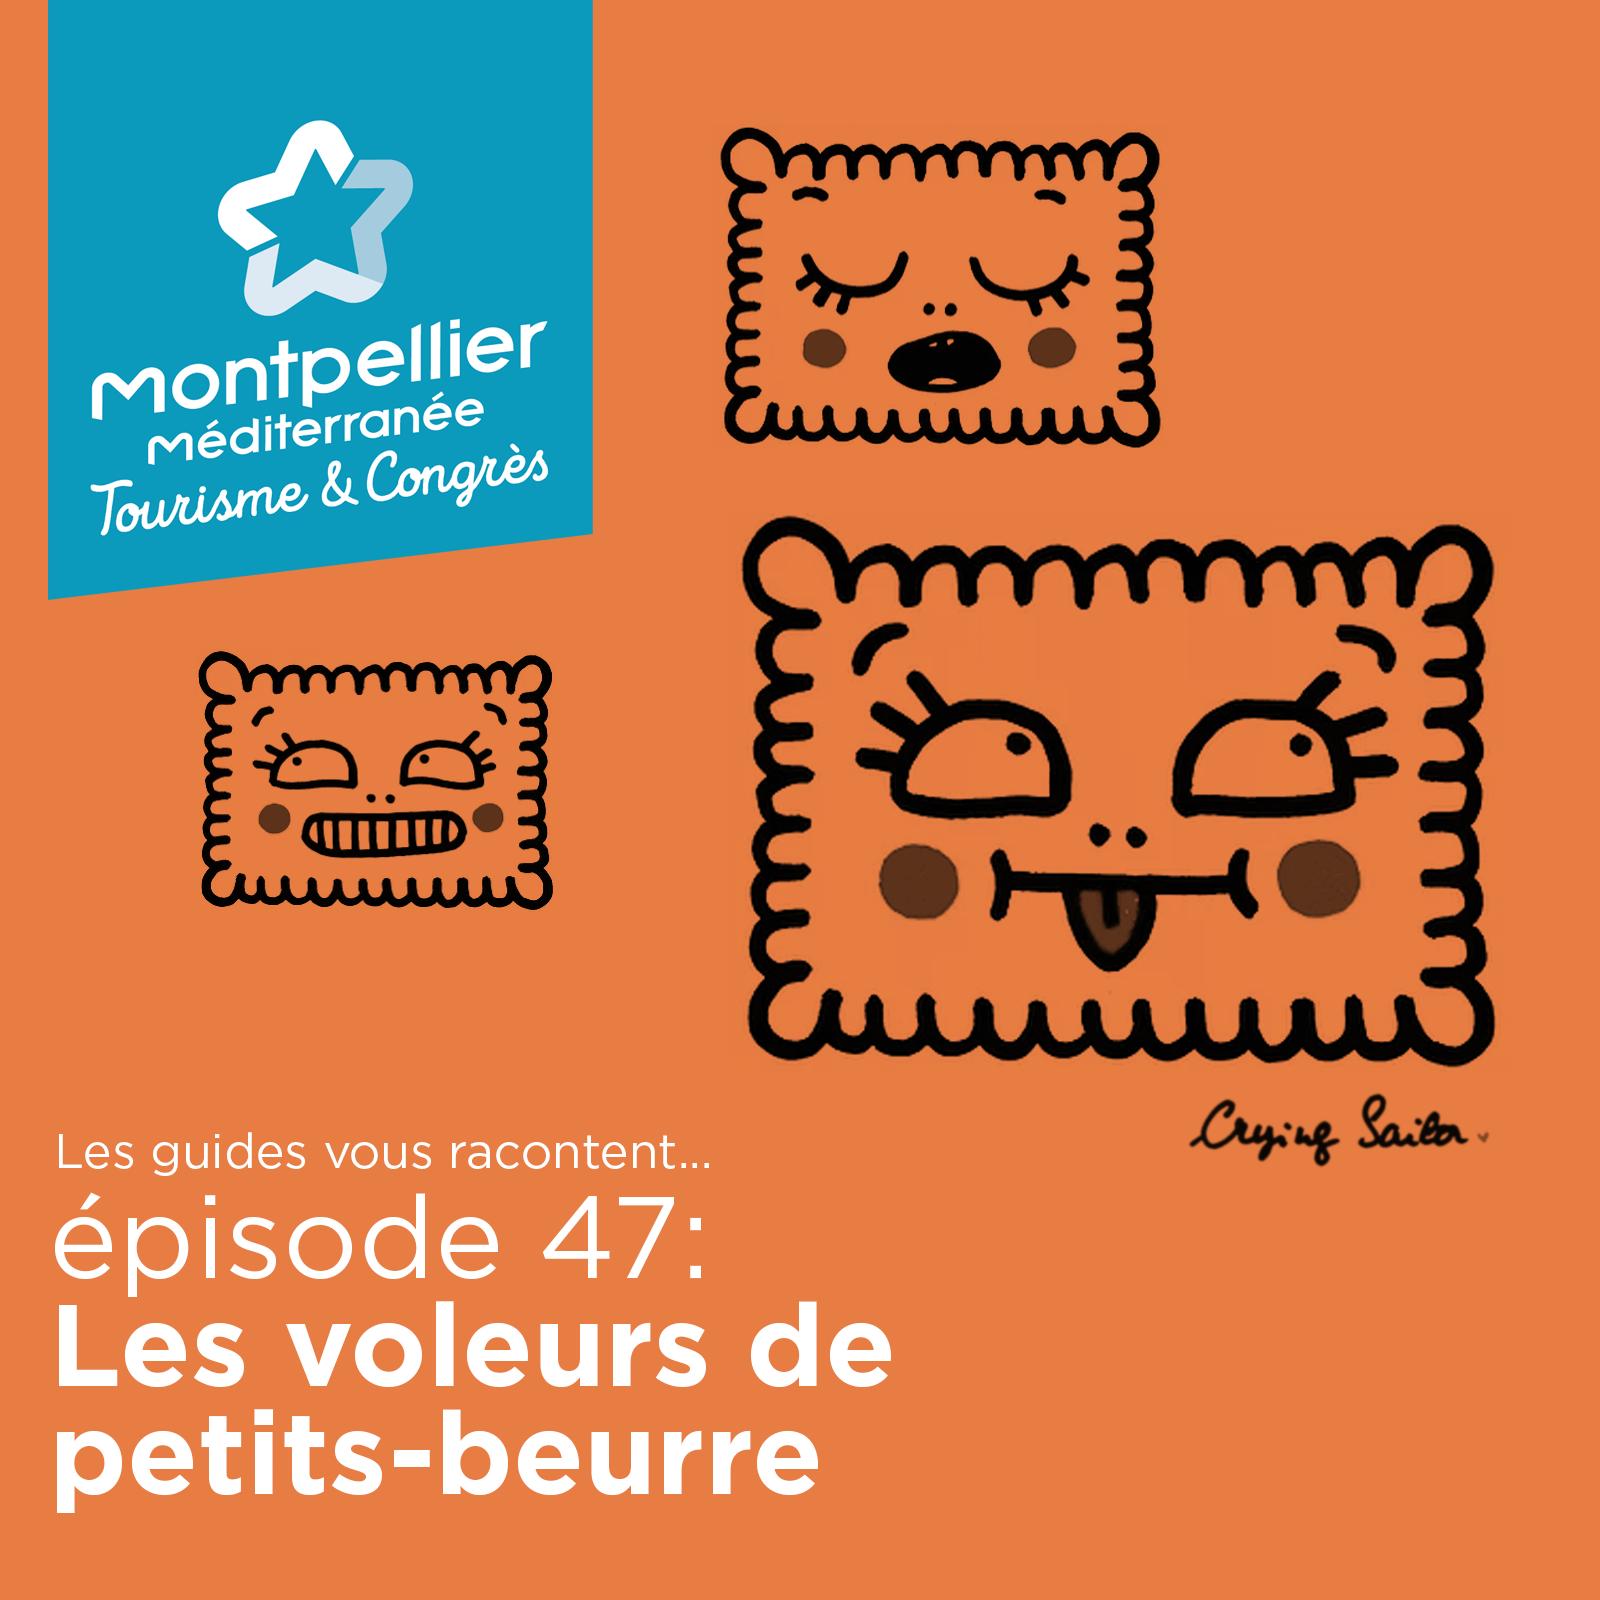 Episode 47: Les voleurs de petits-beurre